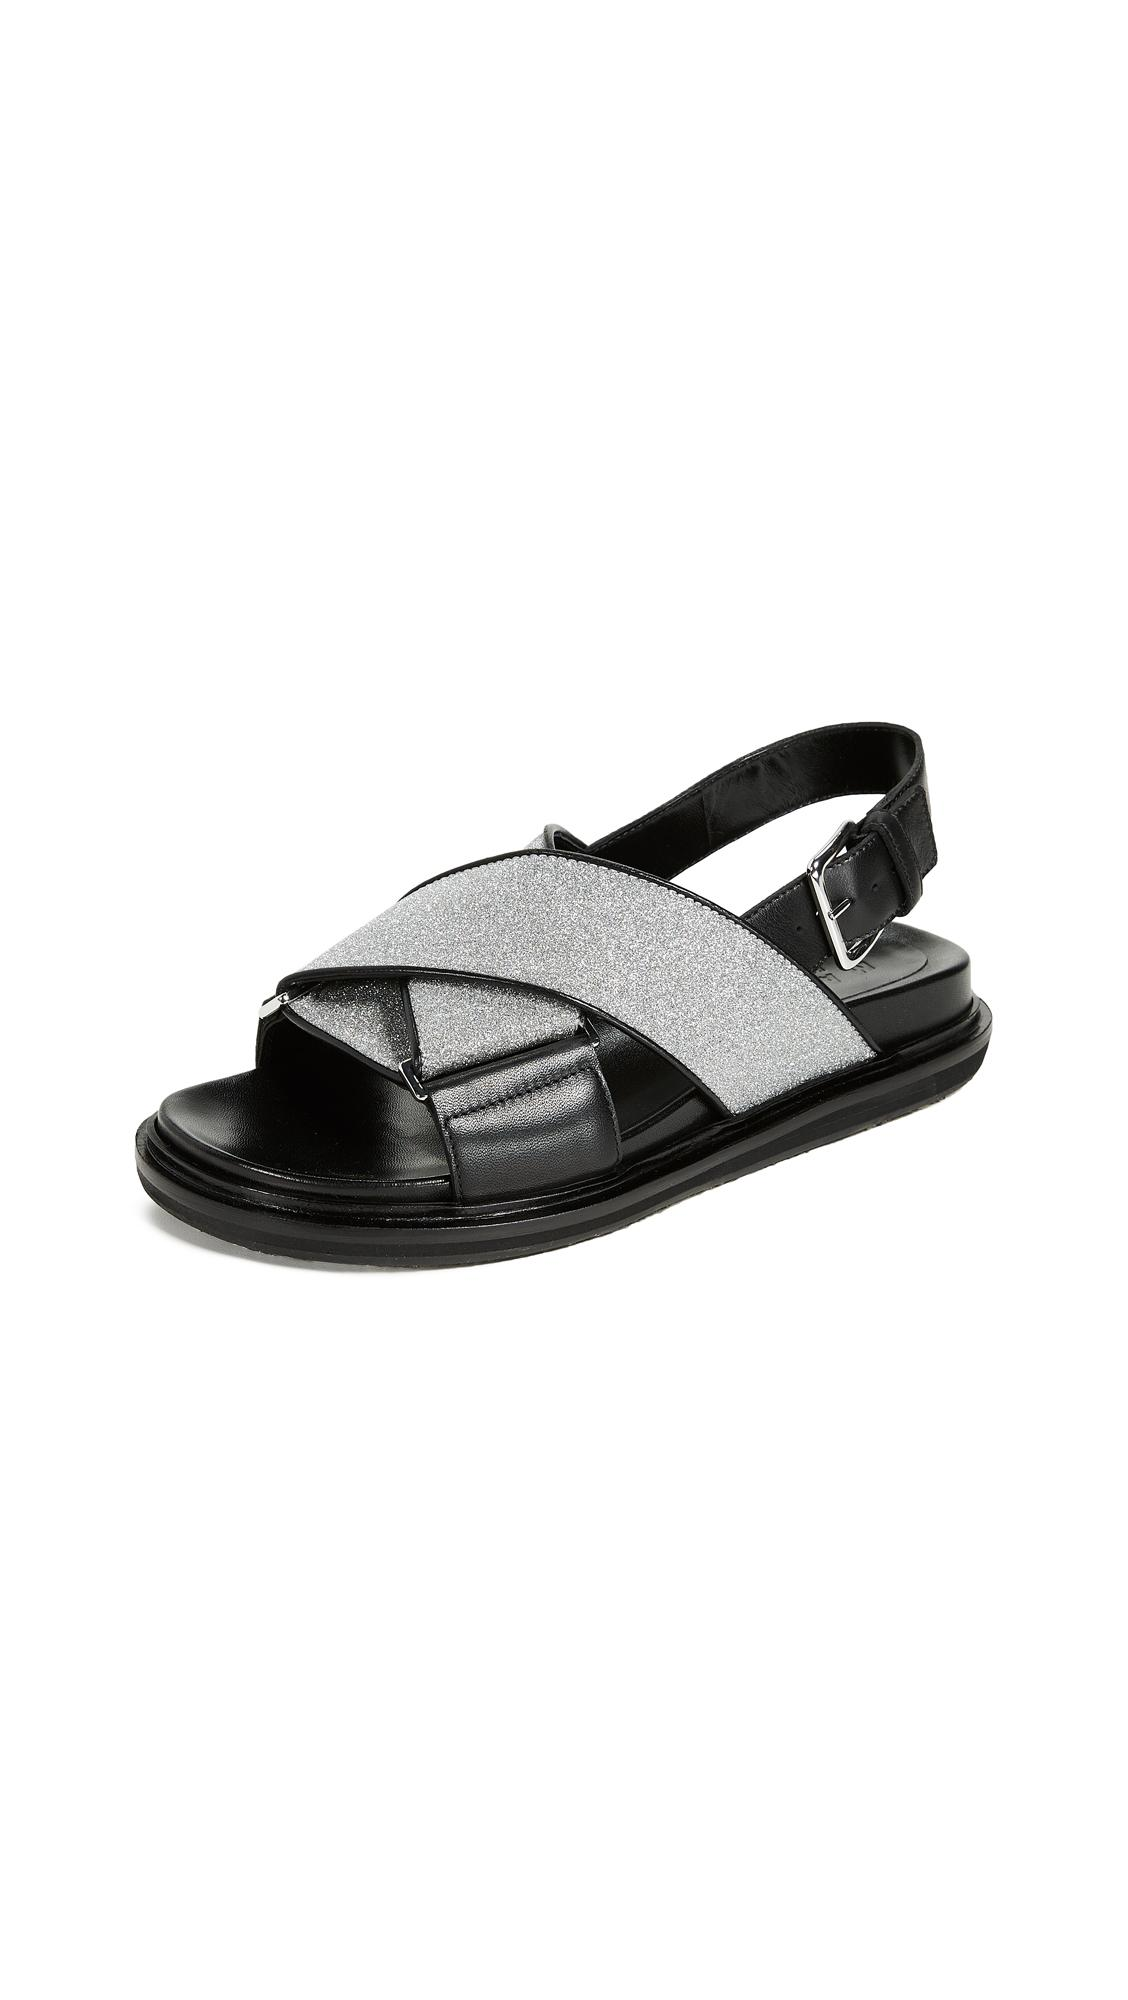 496023440 Marni Glittered Leather Slingback Sandals In Black